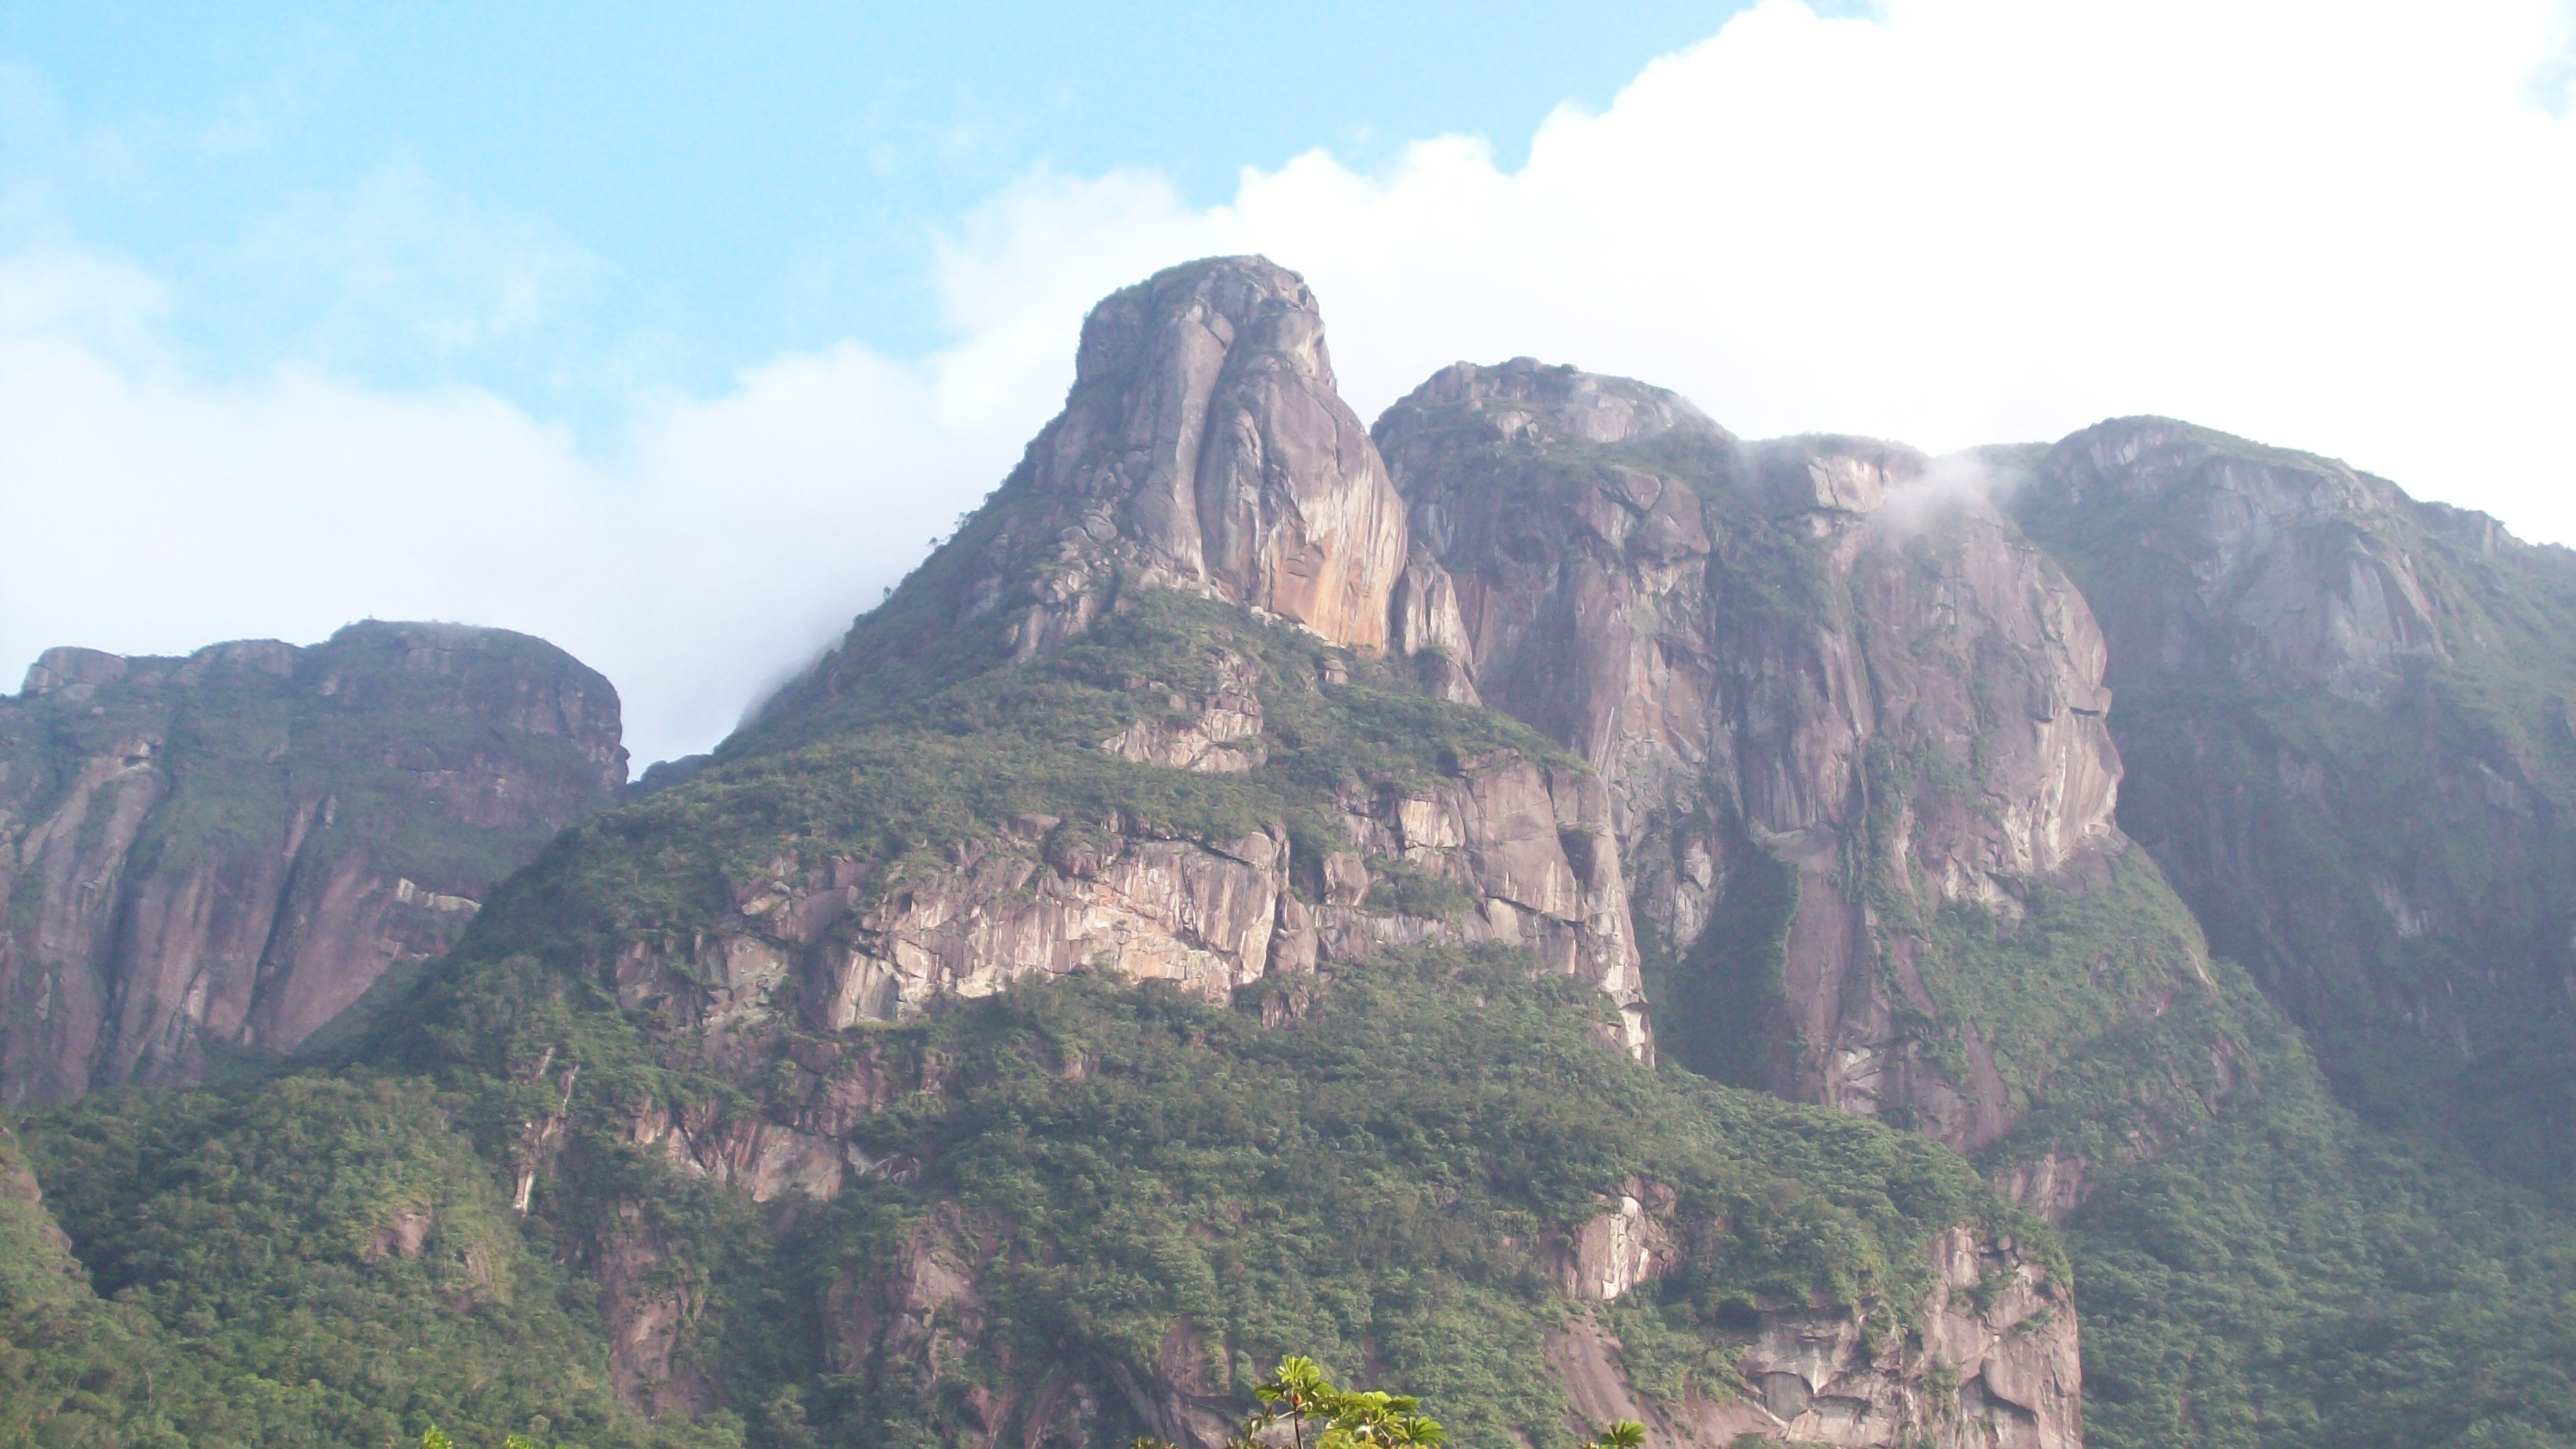 Marumbi Paraná fonte: upload.wikimedia.org